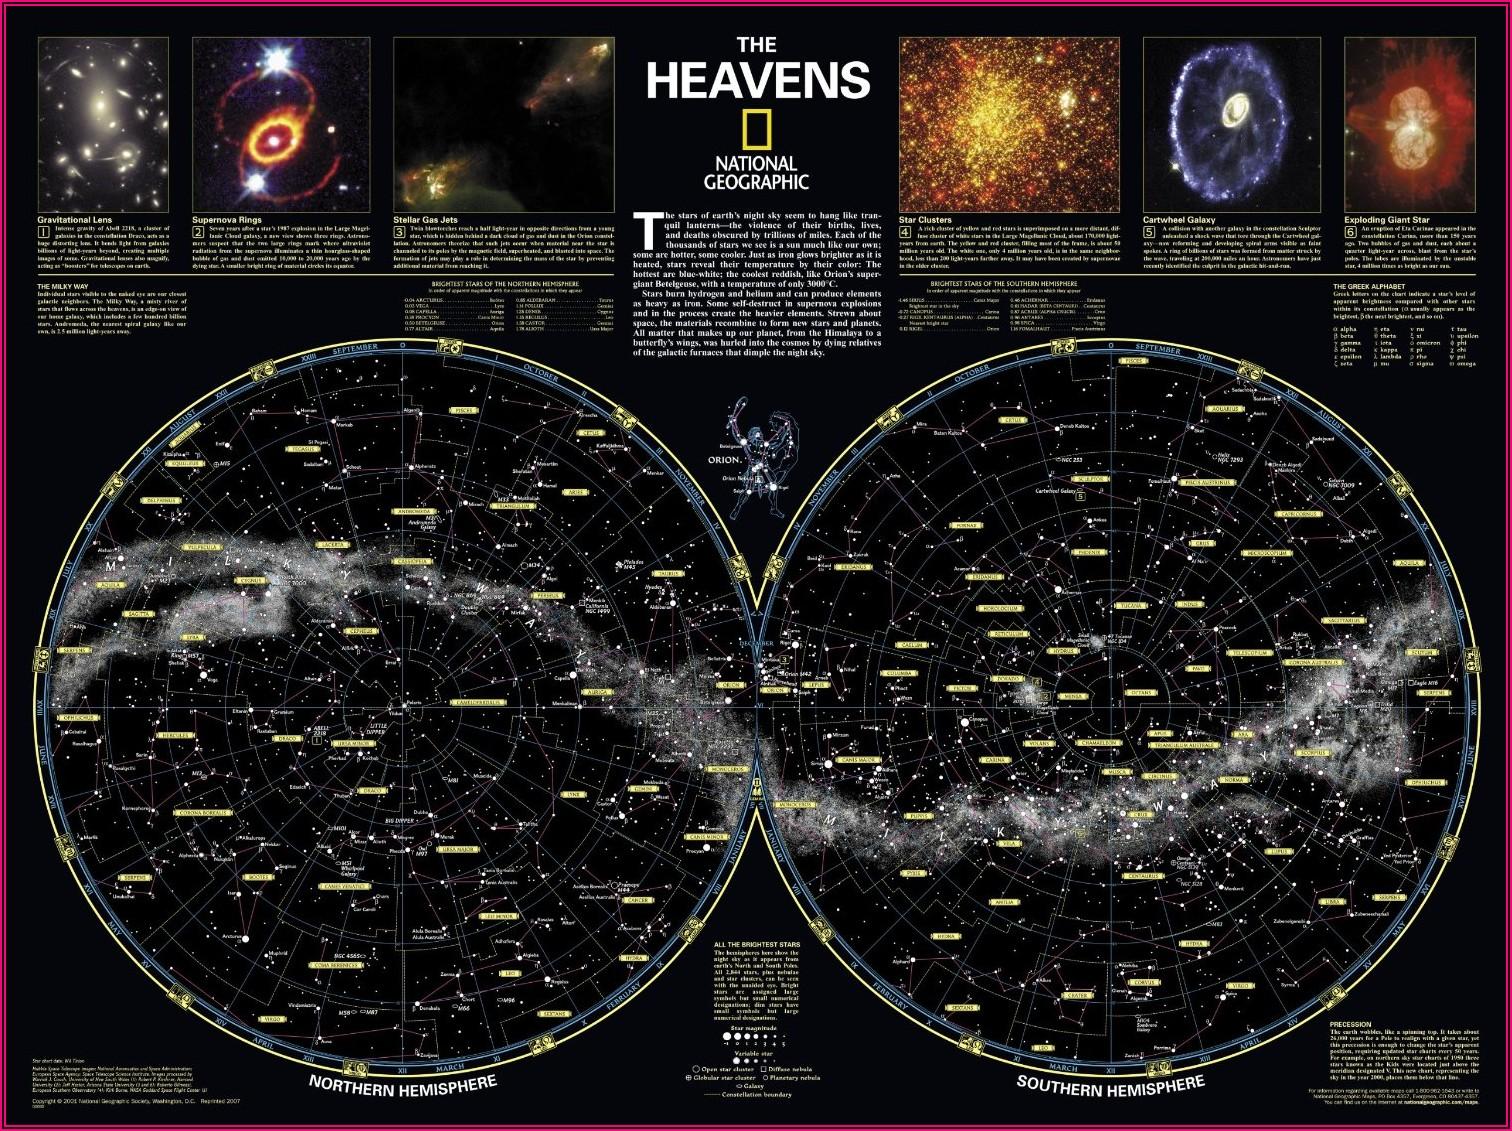 Southern Hemisphere Star Map Pdf